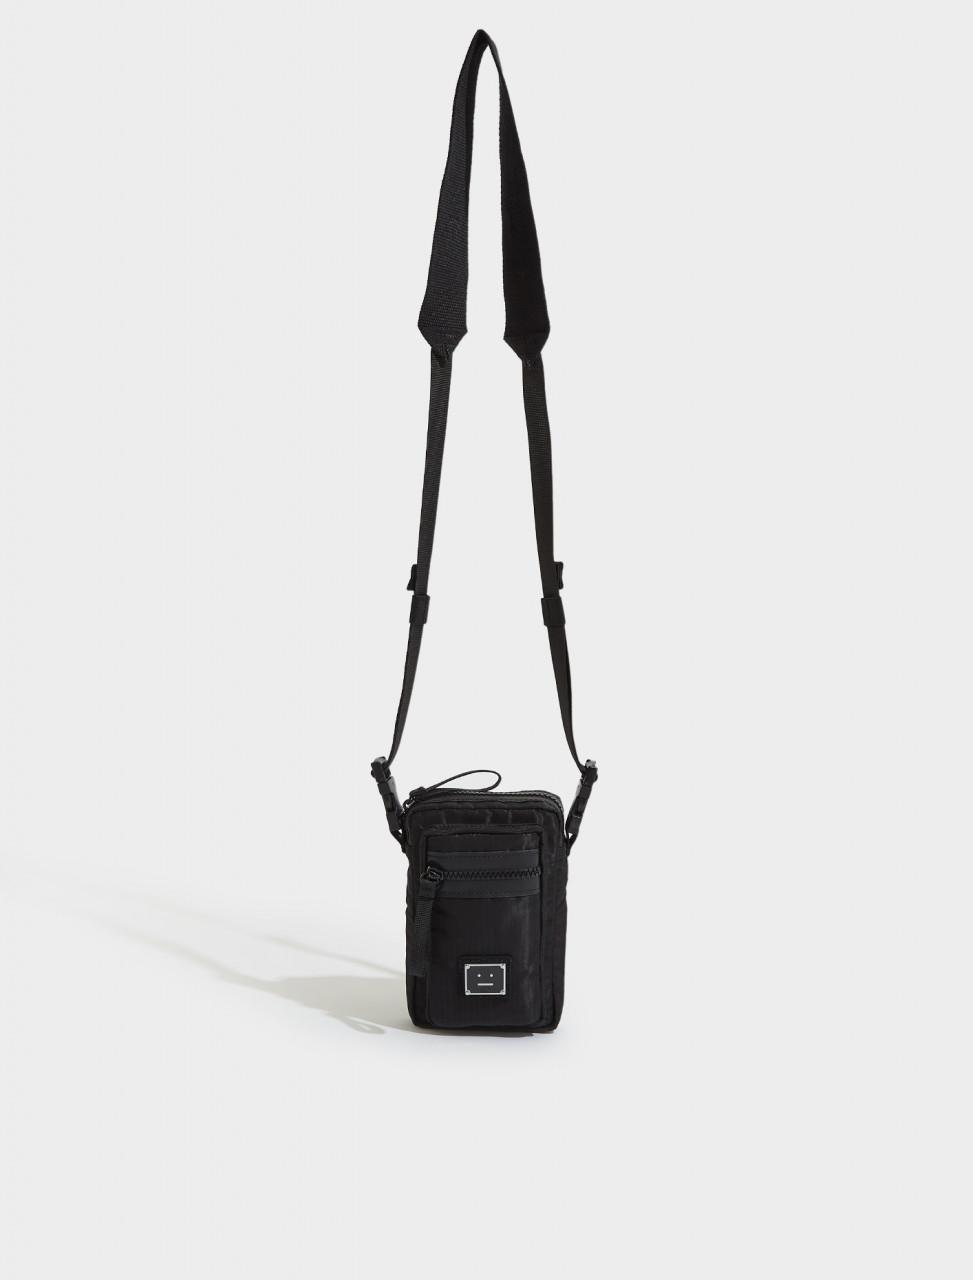 C10092-900-FA-UX-BAGS000020 ACNE STUDIOS ARVEL PLAQUE FACE LOGO POCKET BAG IN BLACK